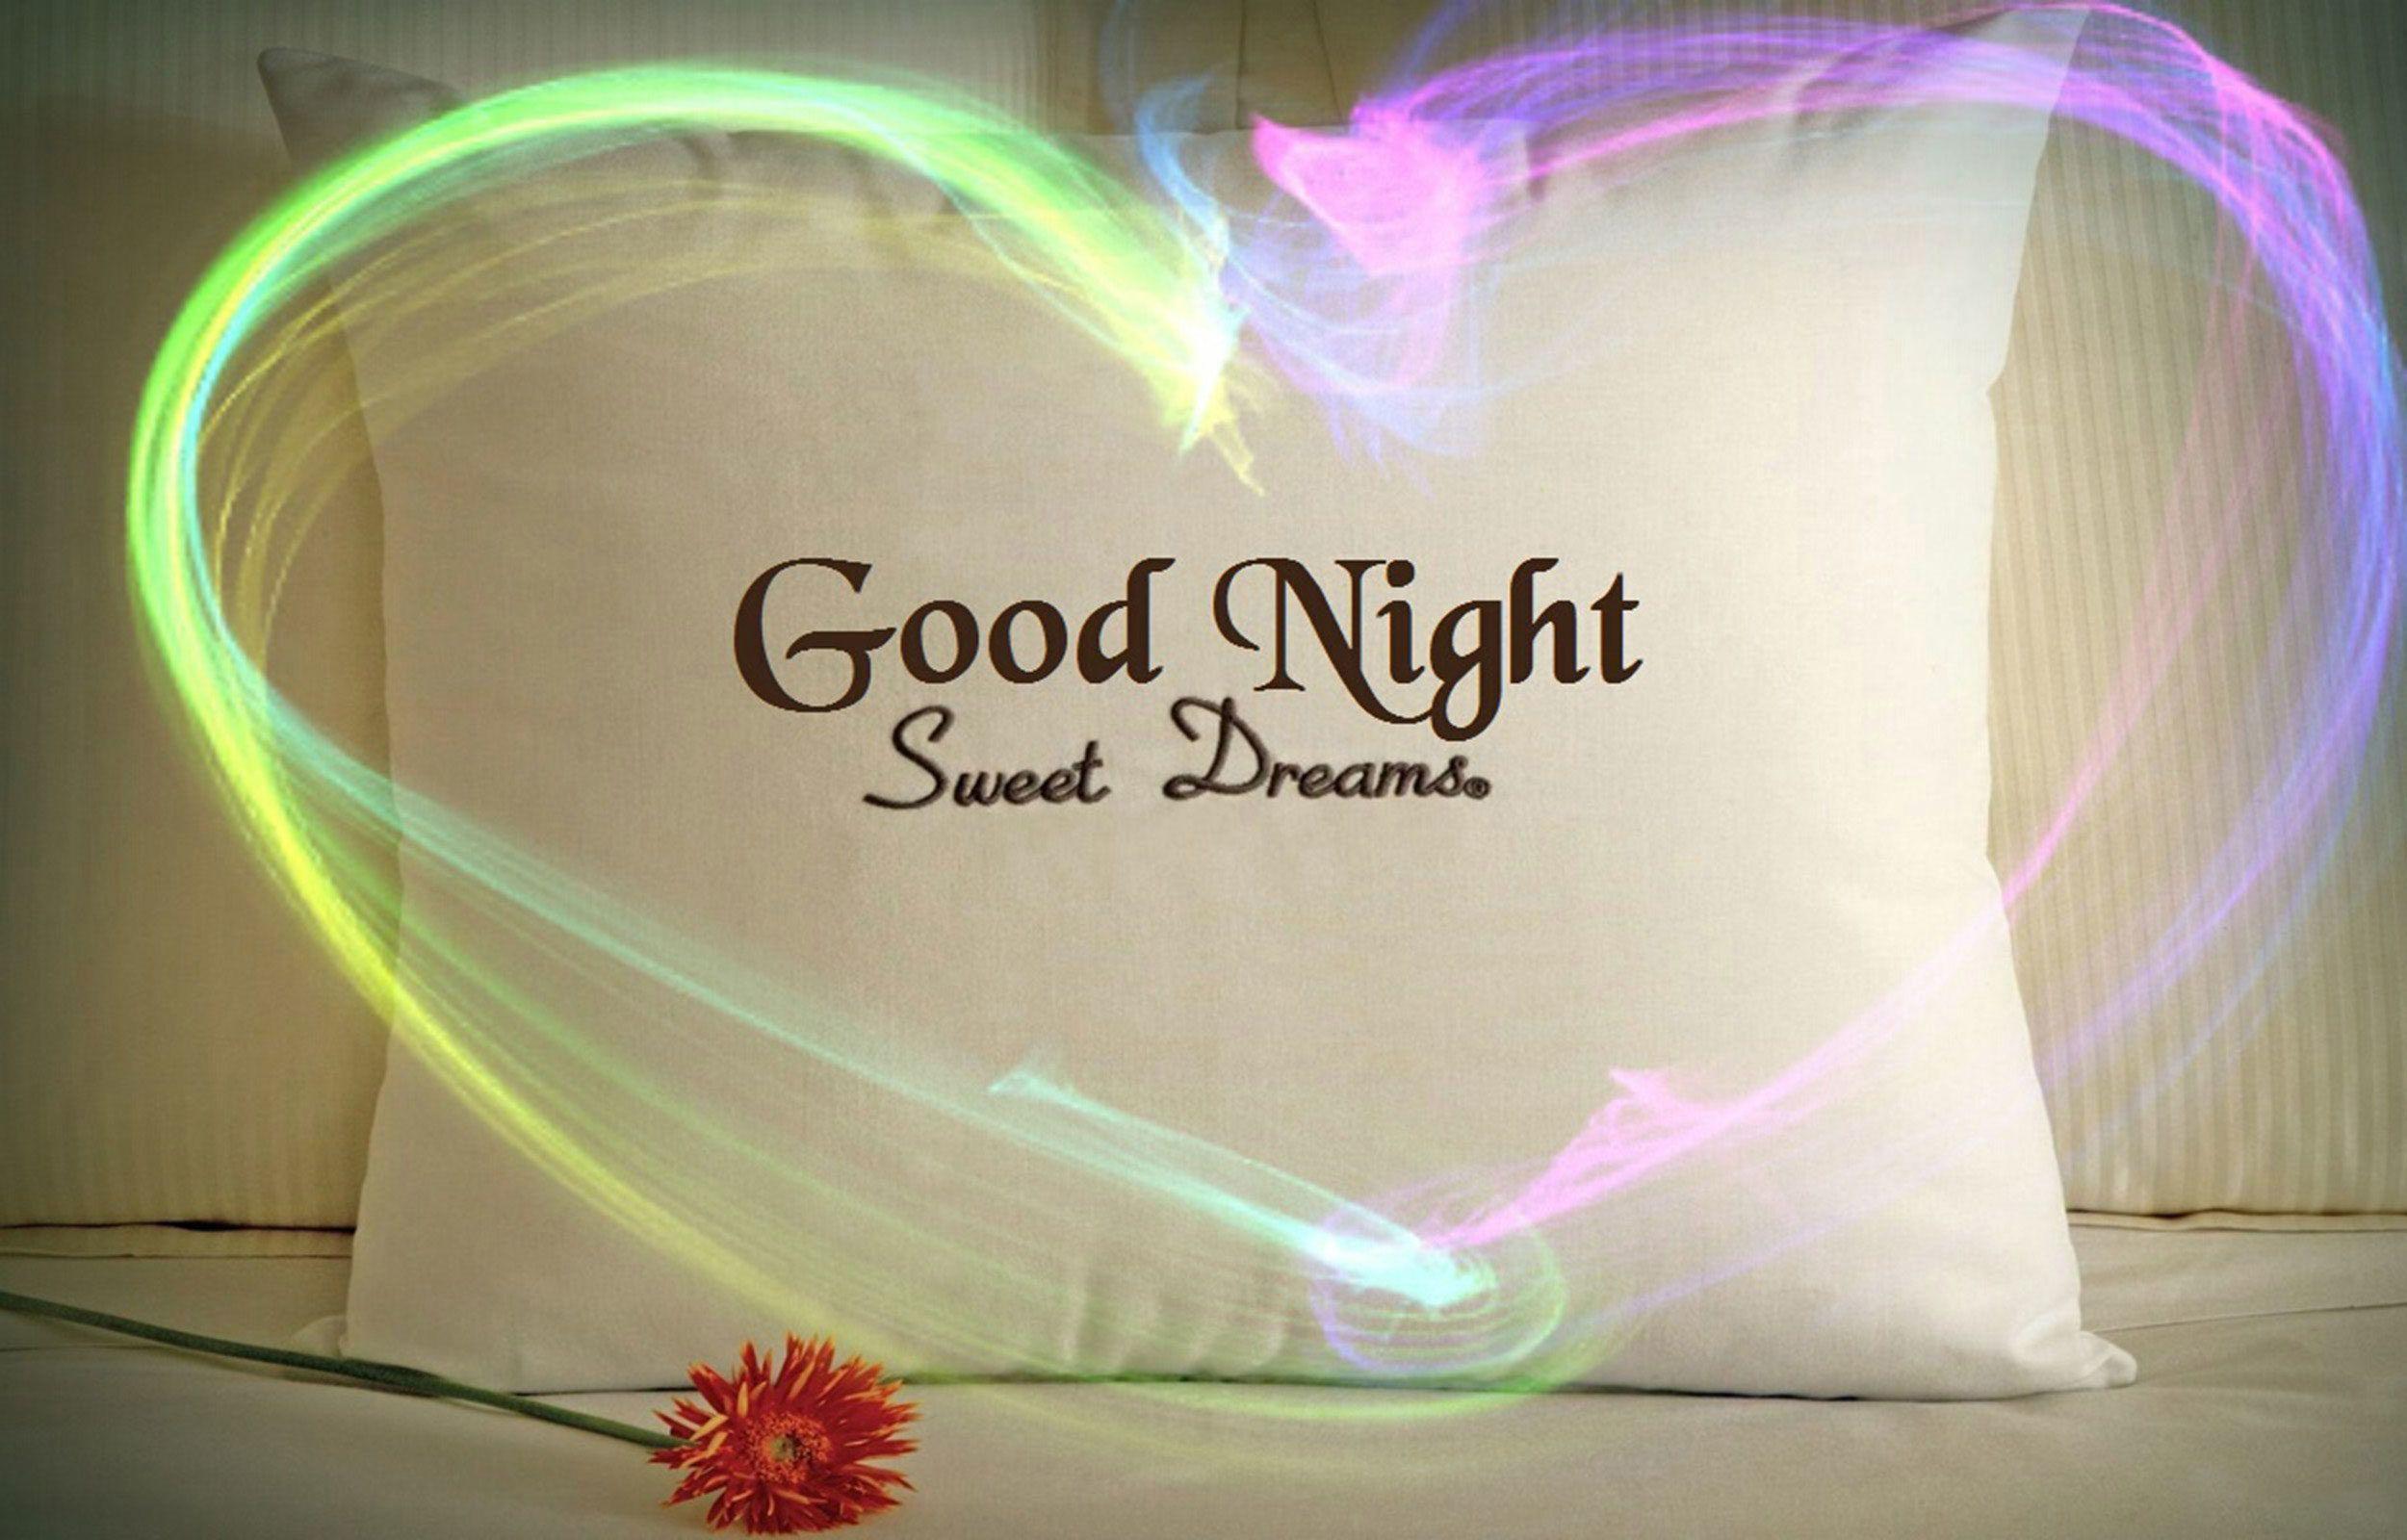 Good Night Hd Wallpapers 3d Wallpaper Cave